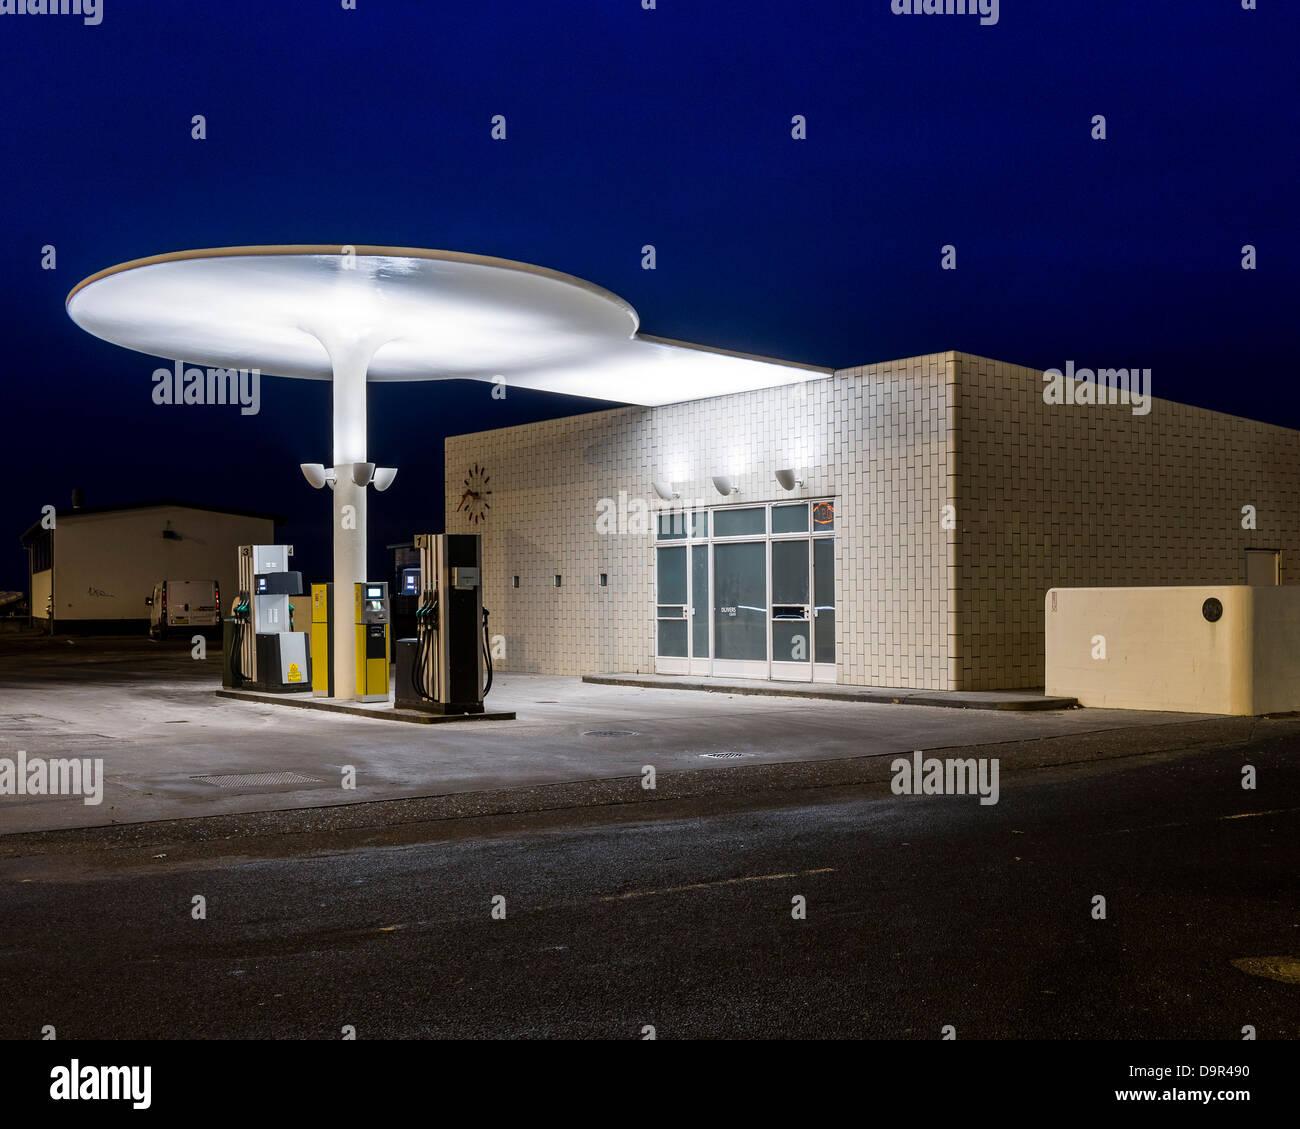 Skovshoved Petrol Station, Copenhagen, Denmark. Architect: Arne Jacobsen, 1936. Side elevation at night. Stock Photo